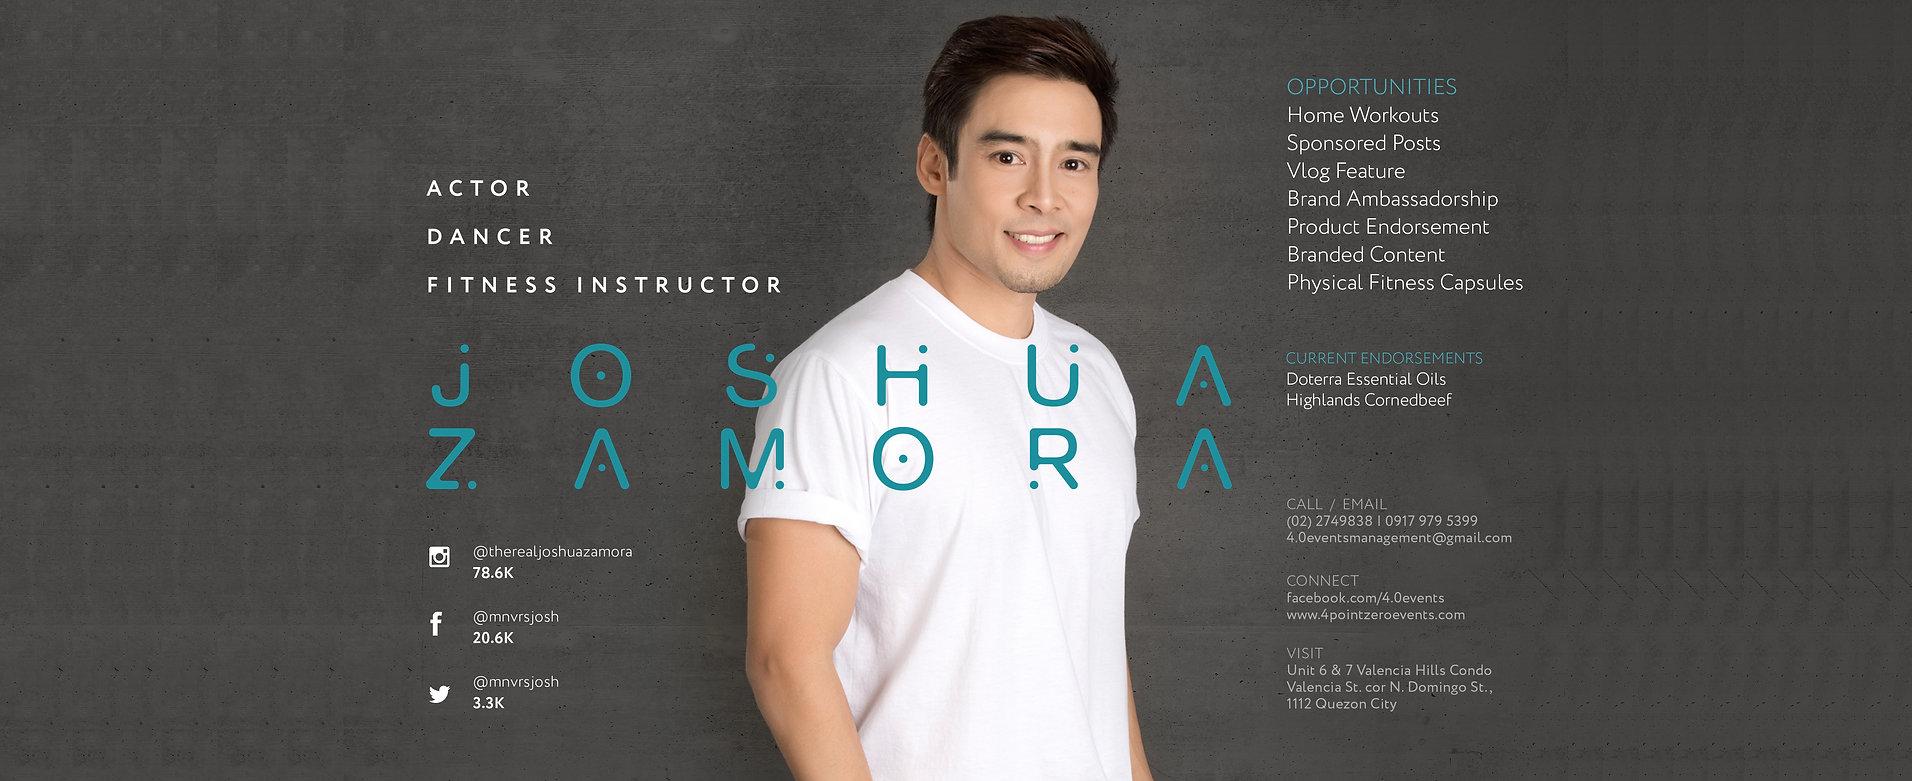 Joshua Zamora MediaKit.jpg